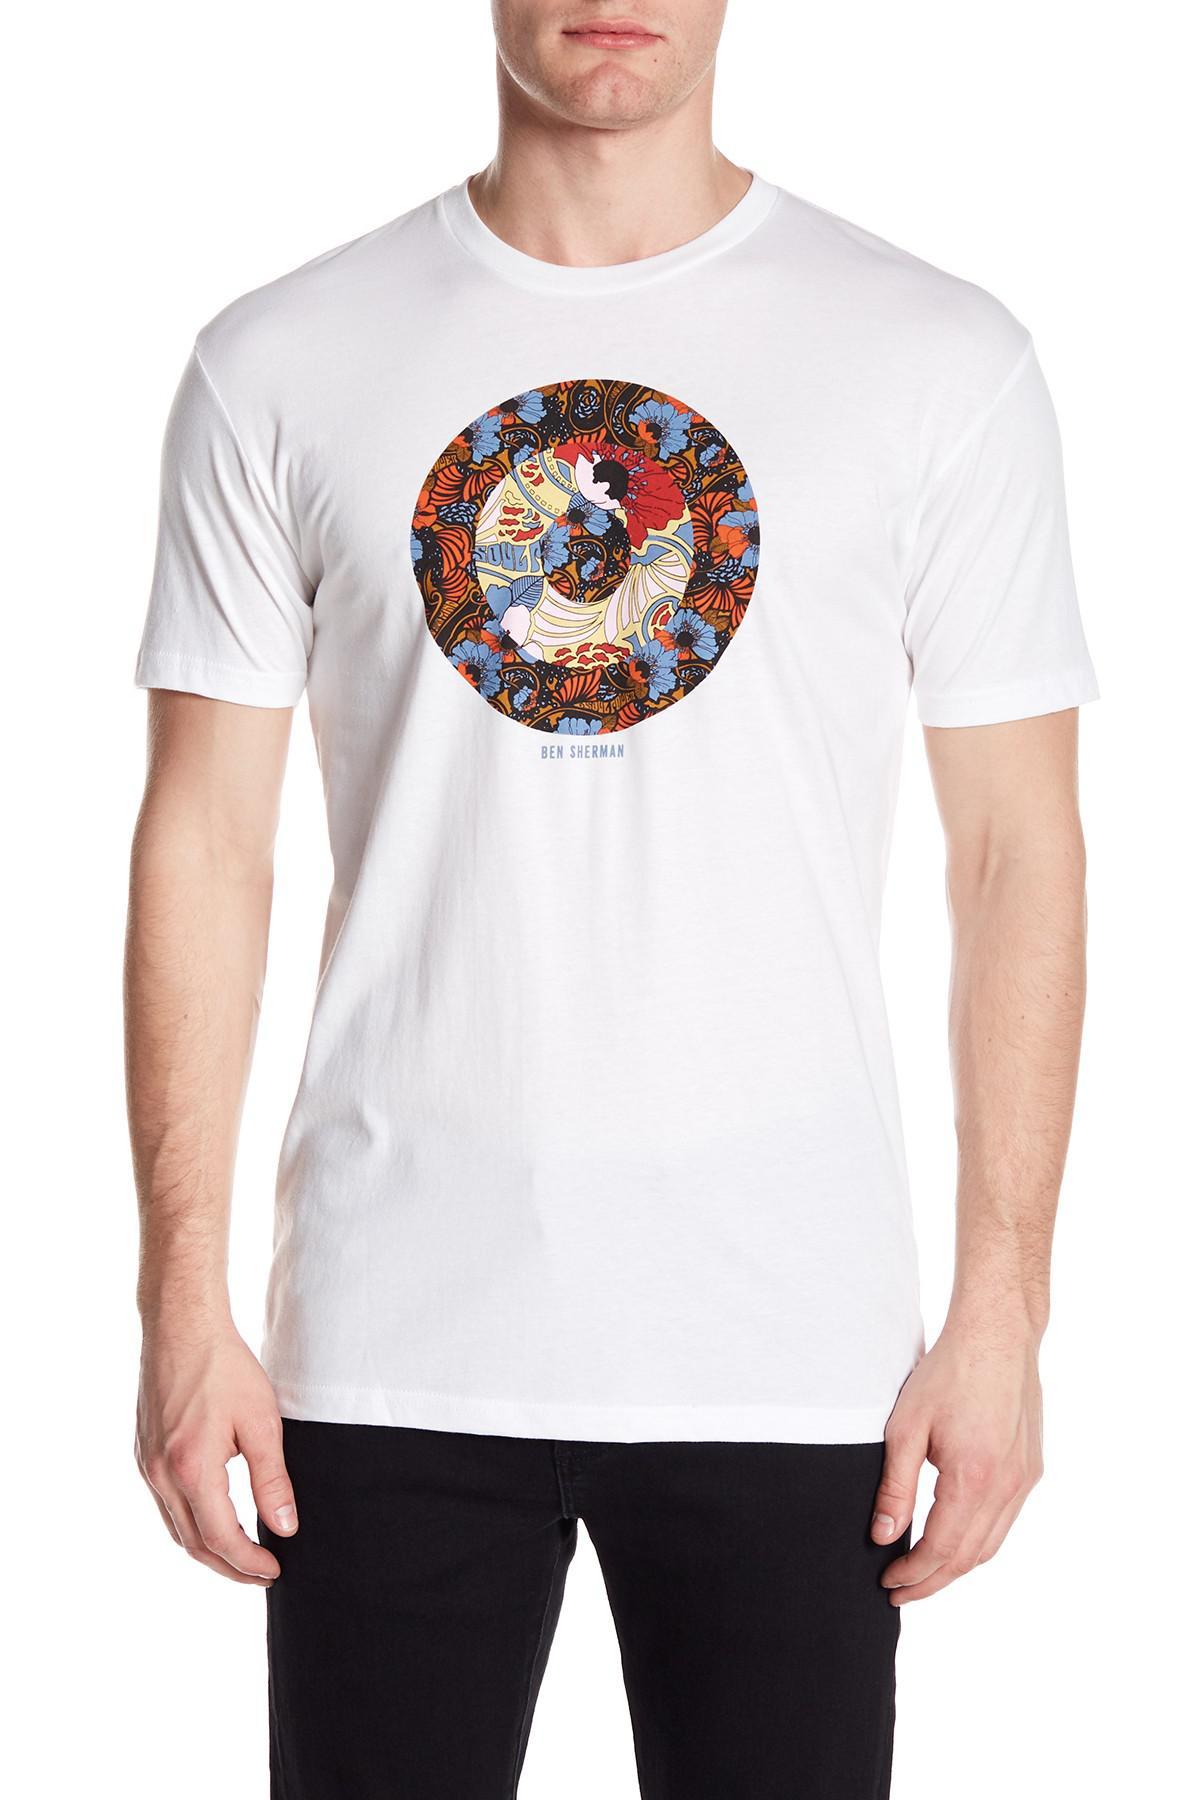 923bcccb8 Ben Sherman Hero Target T-shirt in White for Men - Lyst